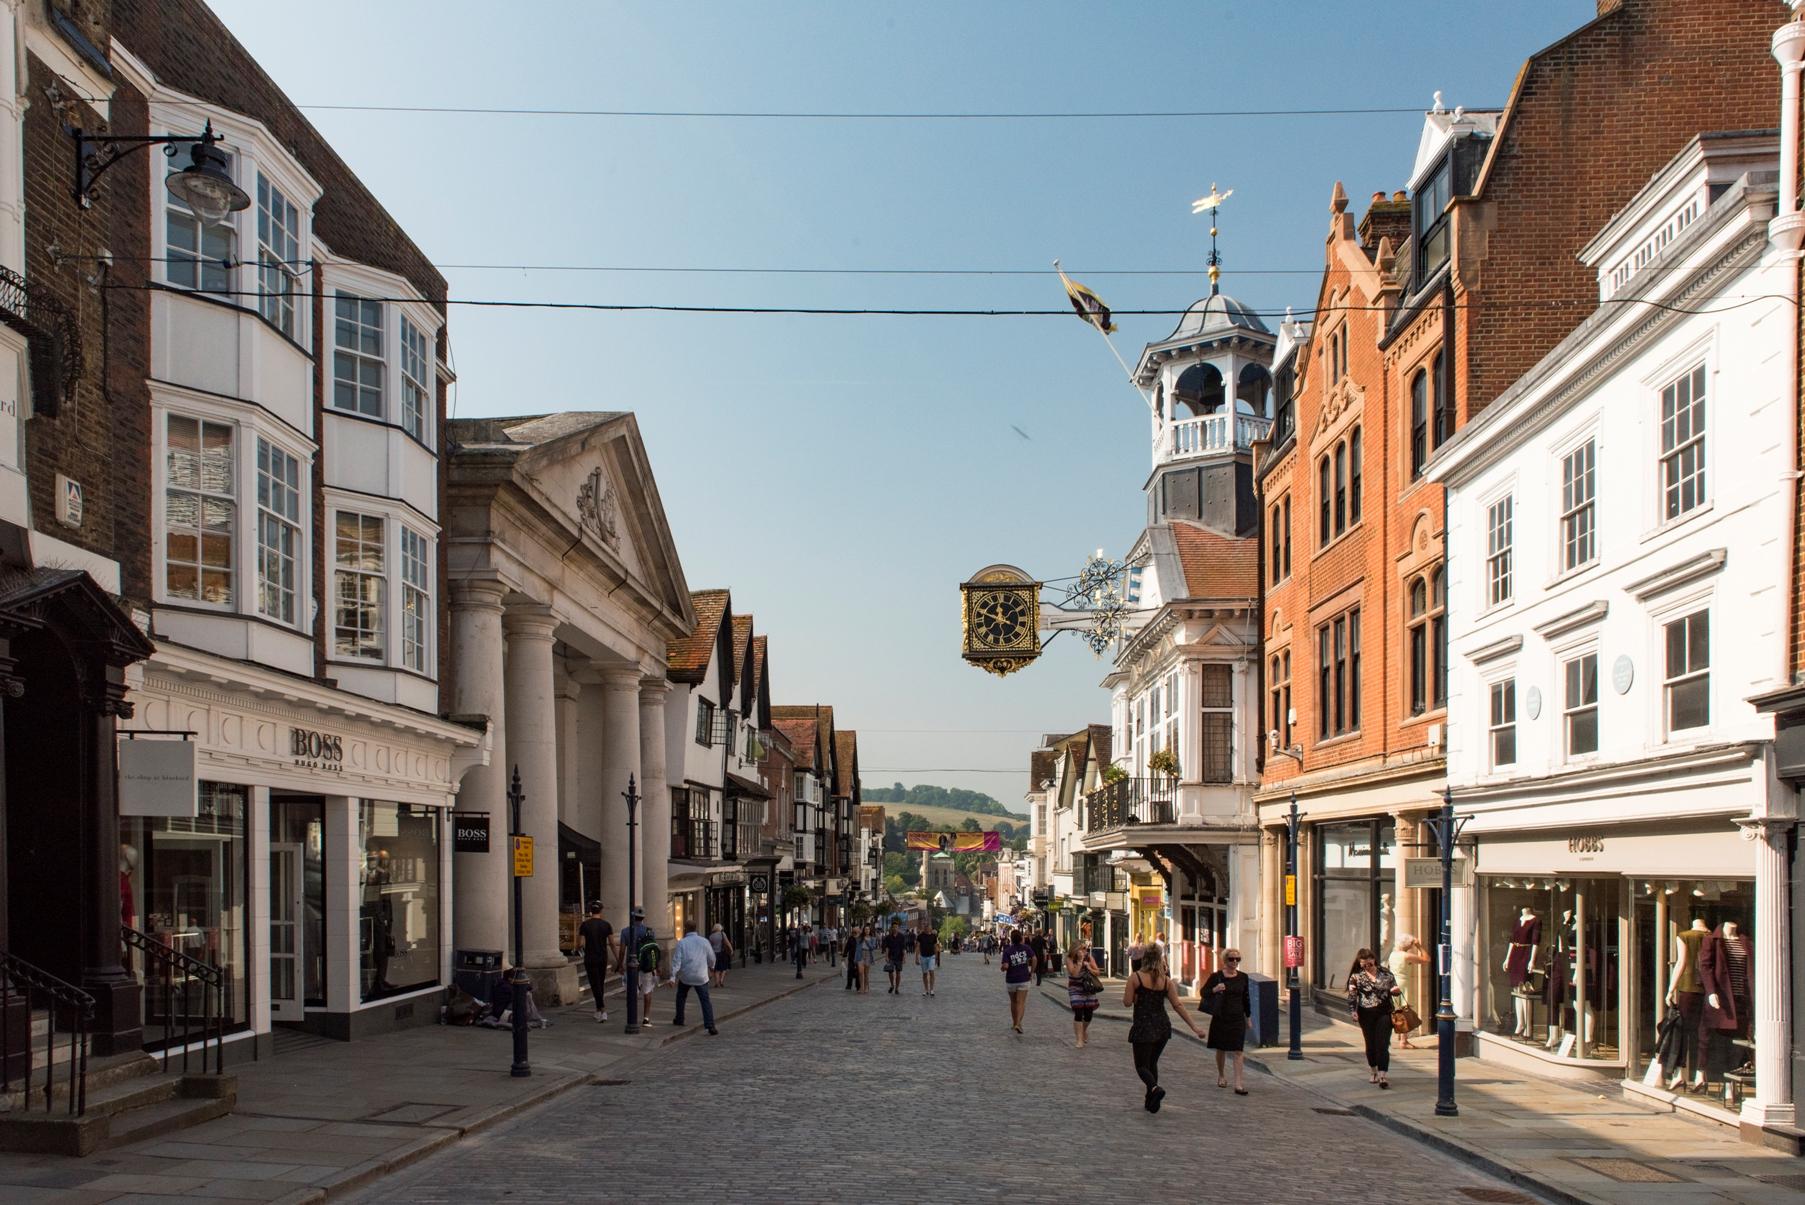 High Street © Guildford Borough Council